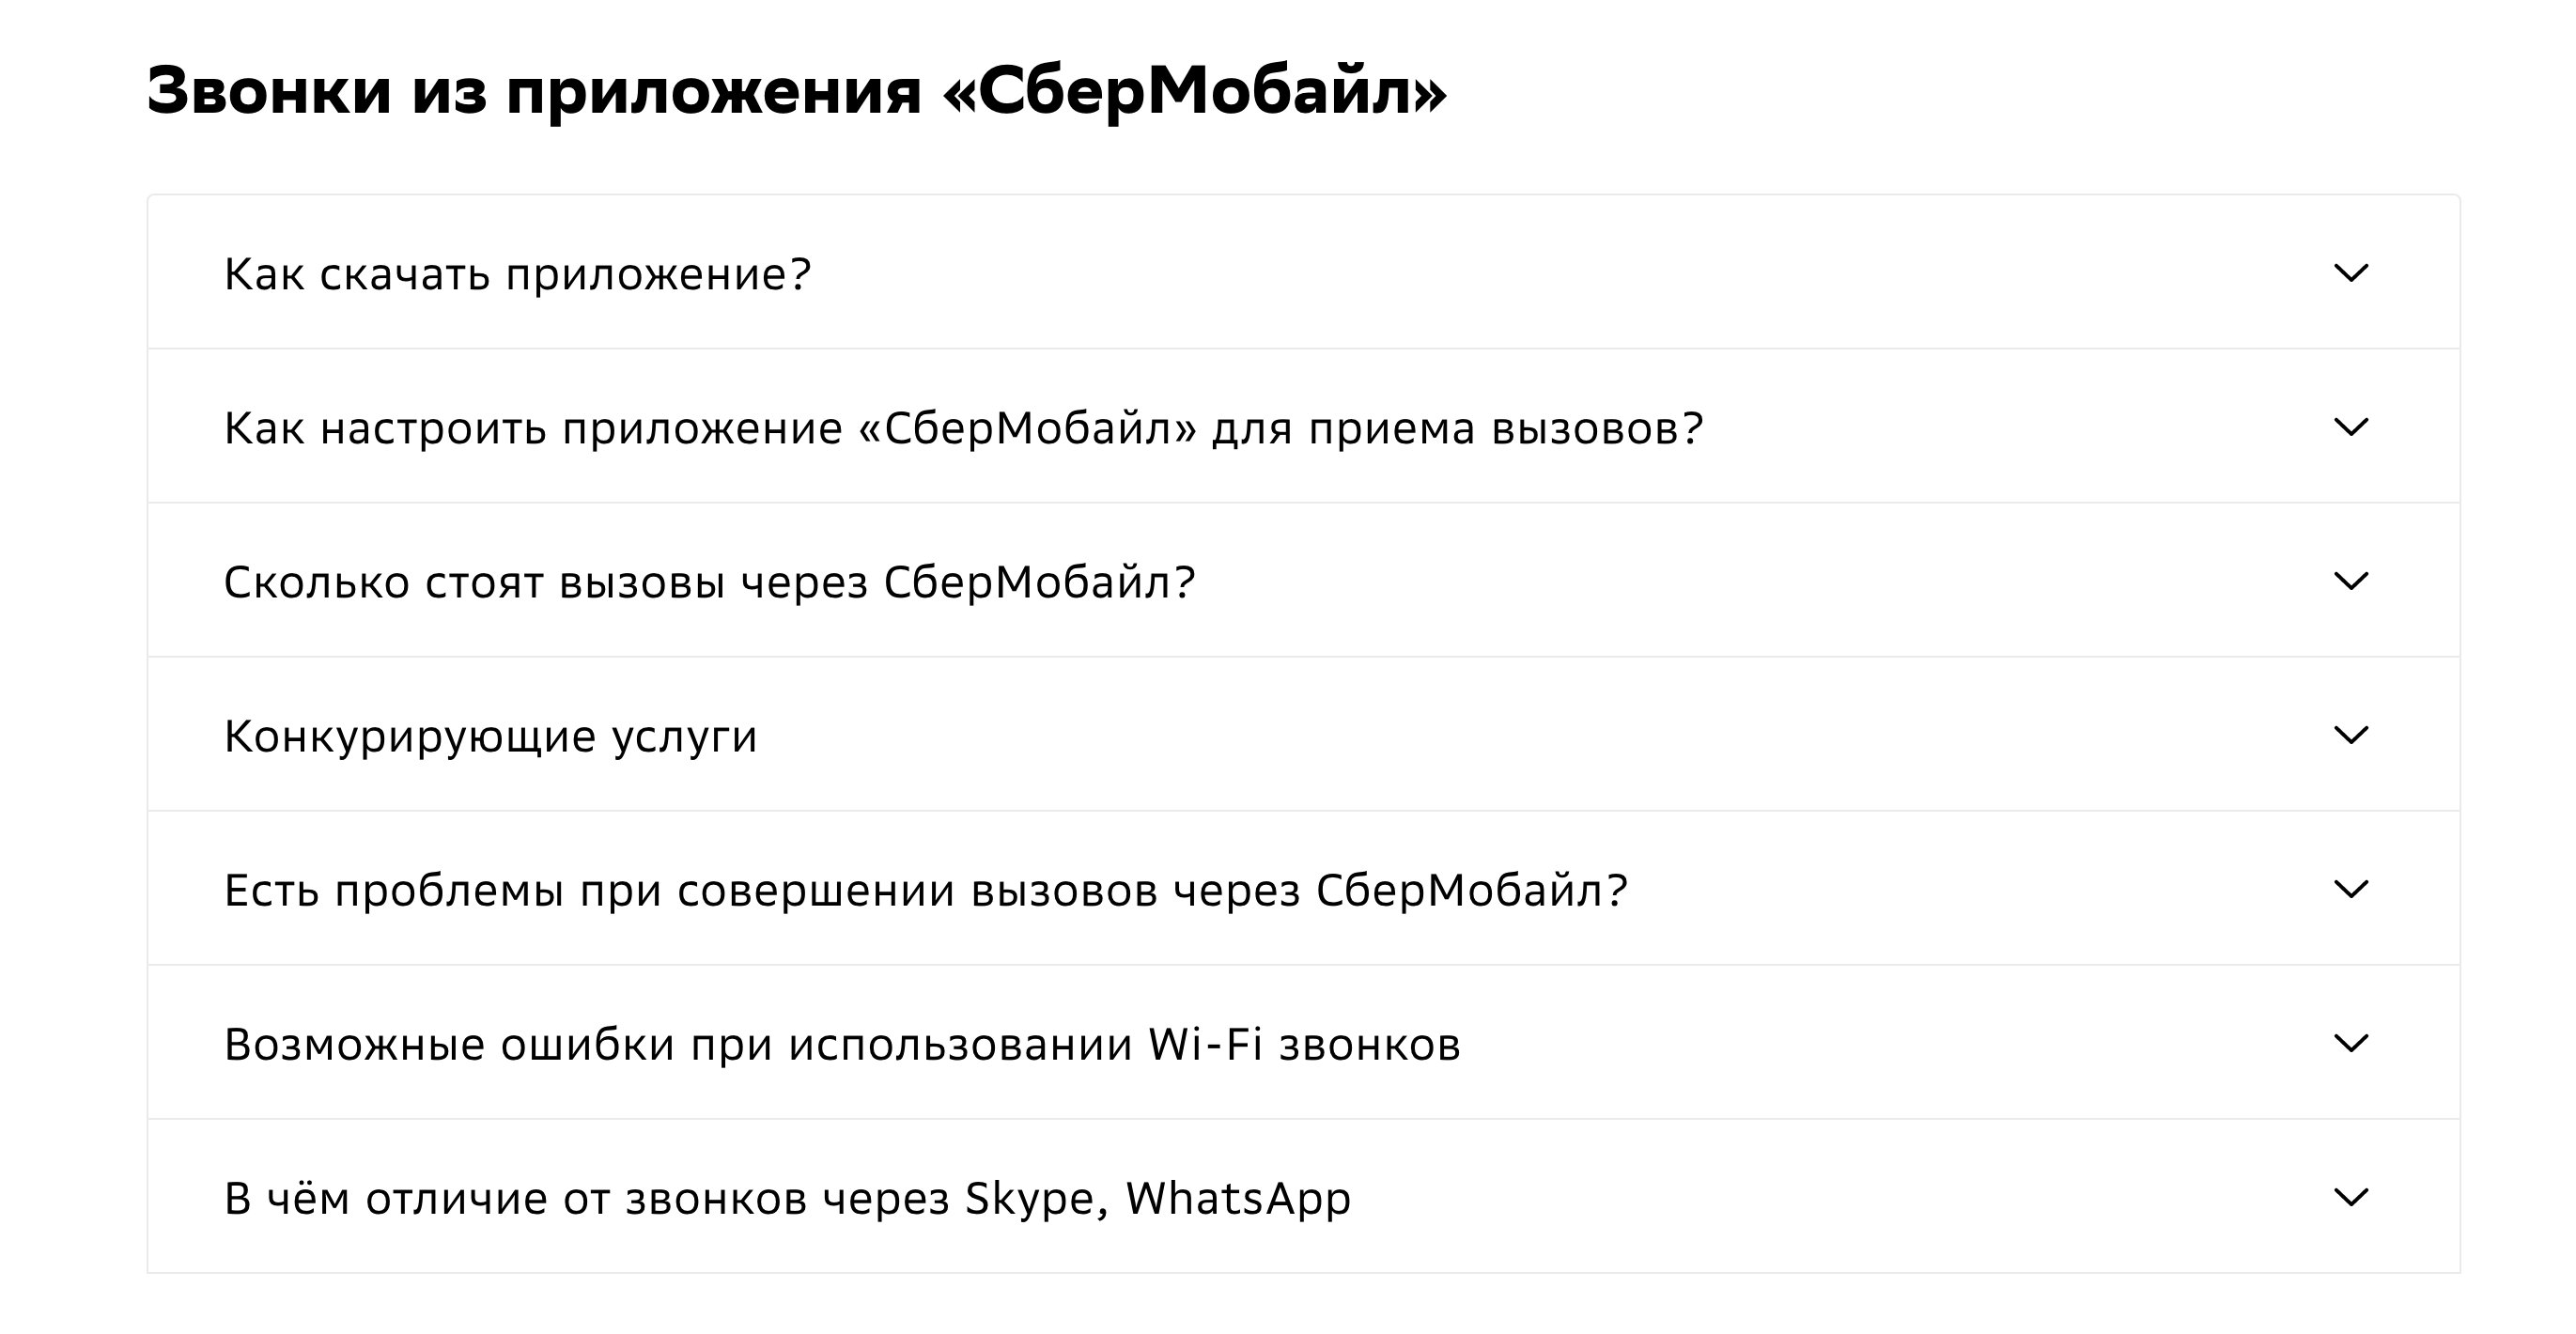 wi-fi звонки сбермобайл - звонки из приложения